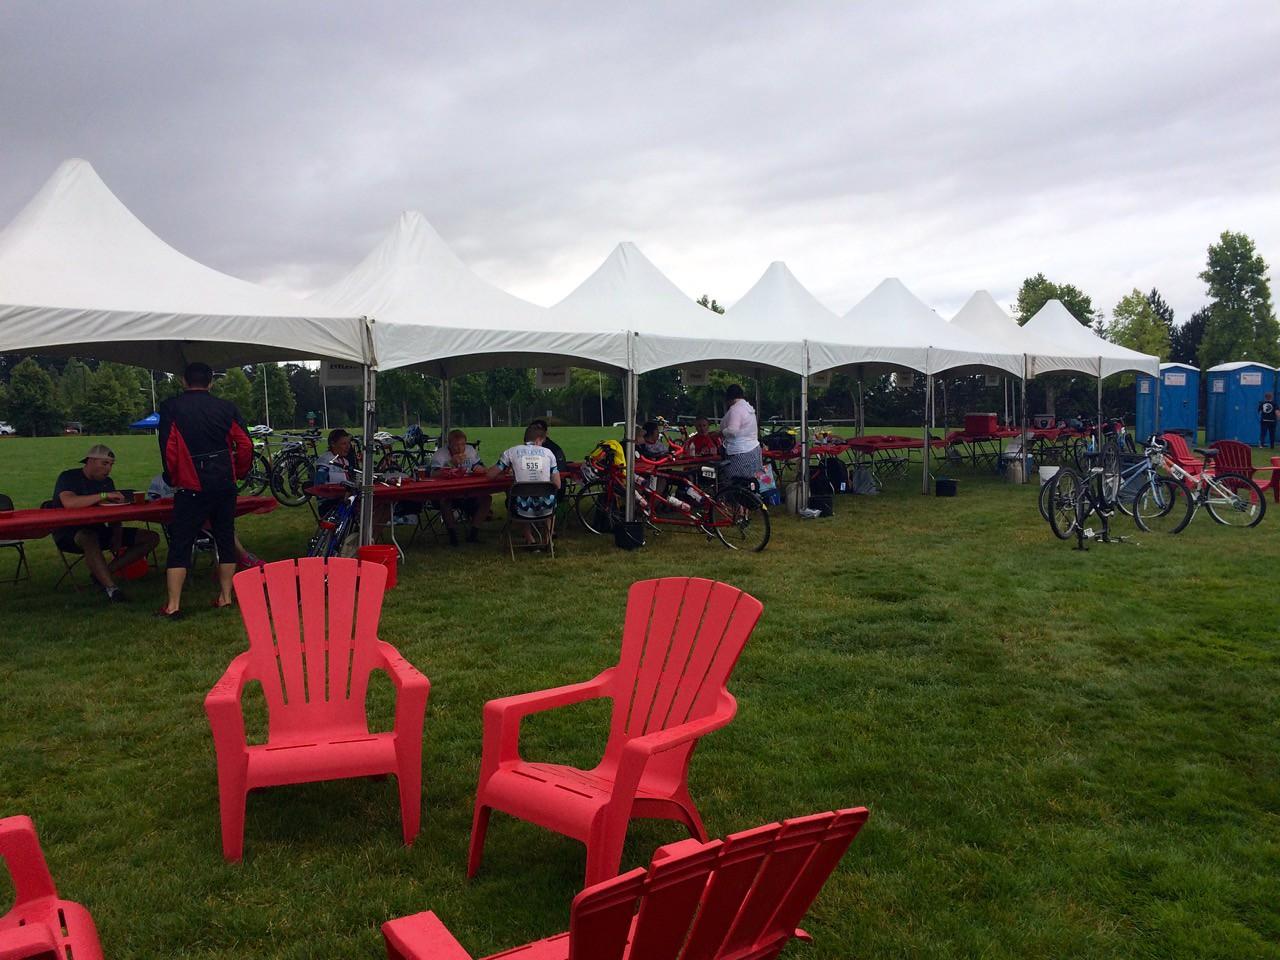 2015 Tour de Cure Oregon, Amberglen Park, Hillsboro.<br /> Team Tents ($5K teams)